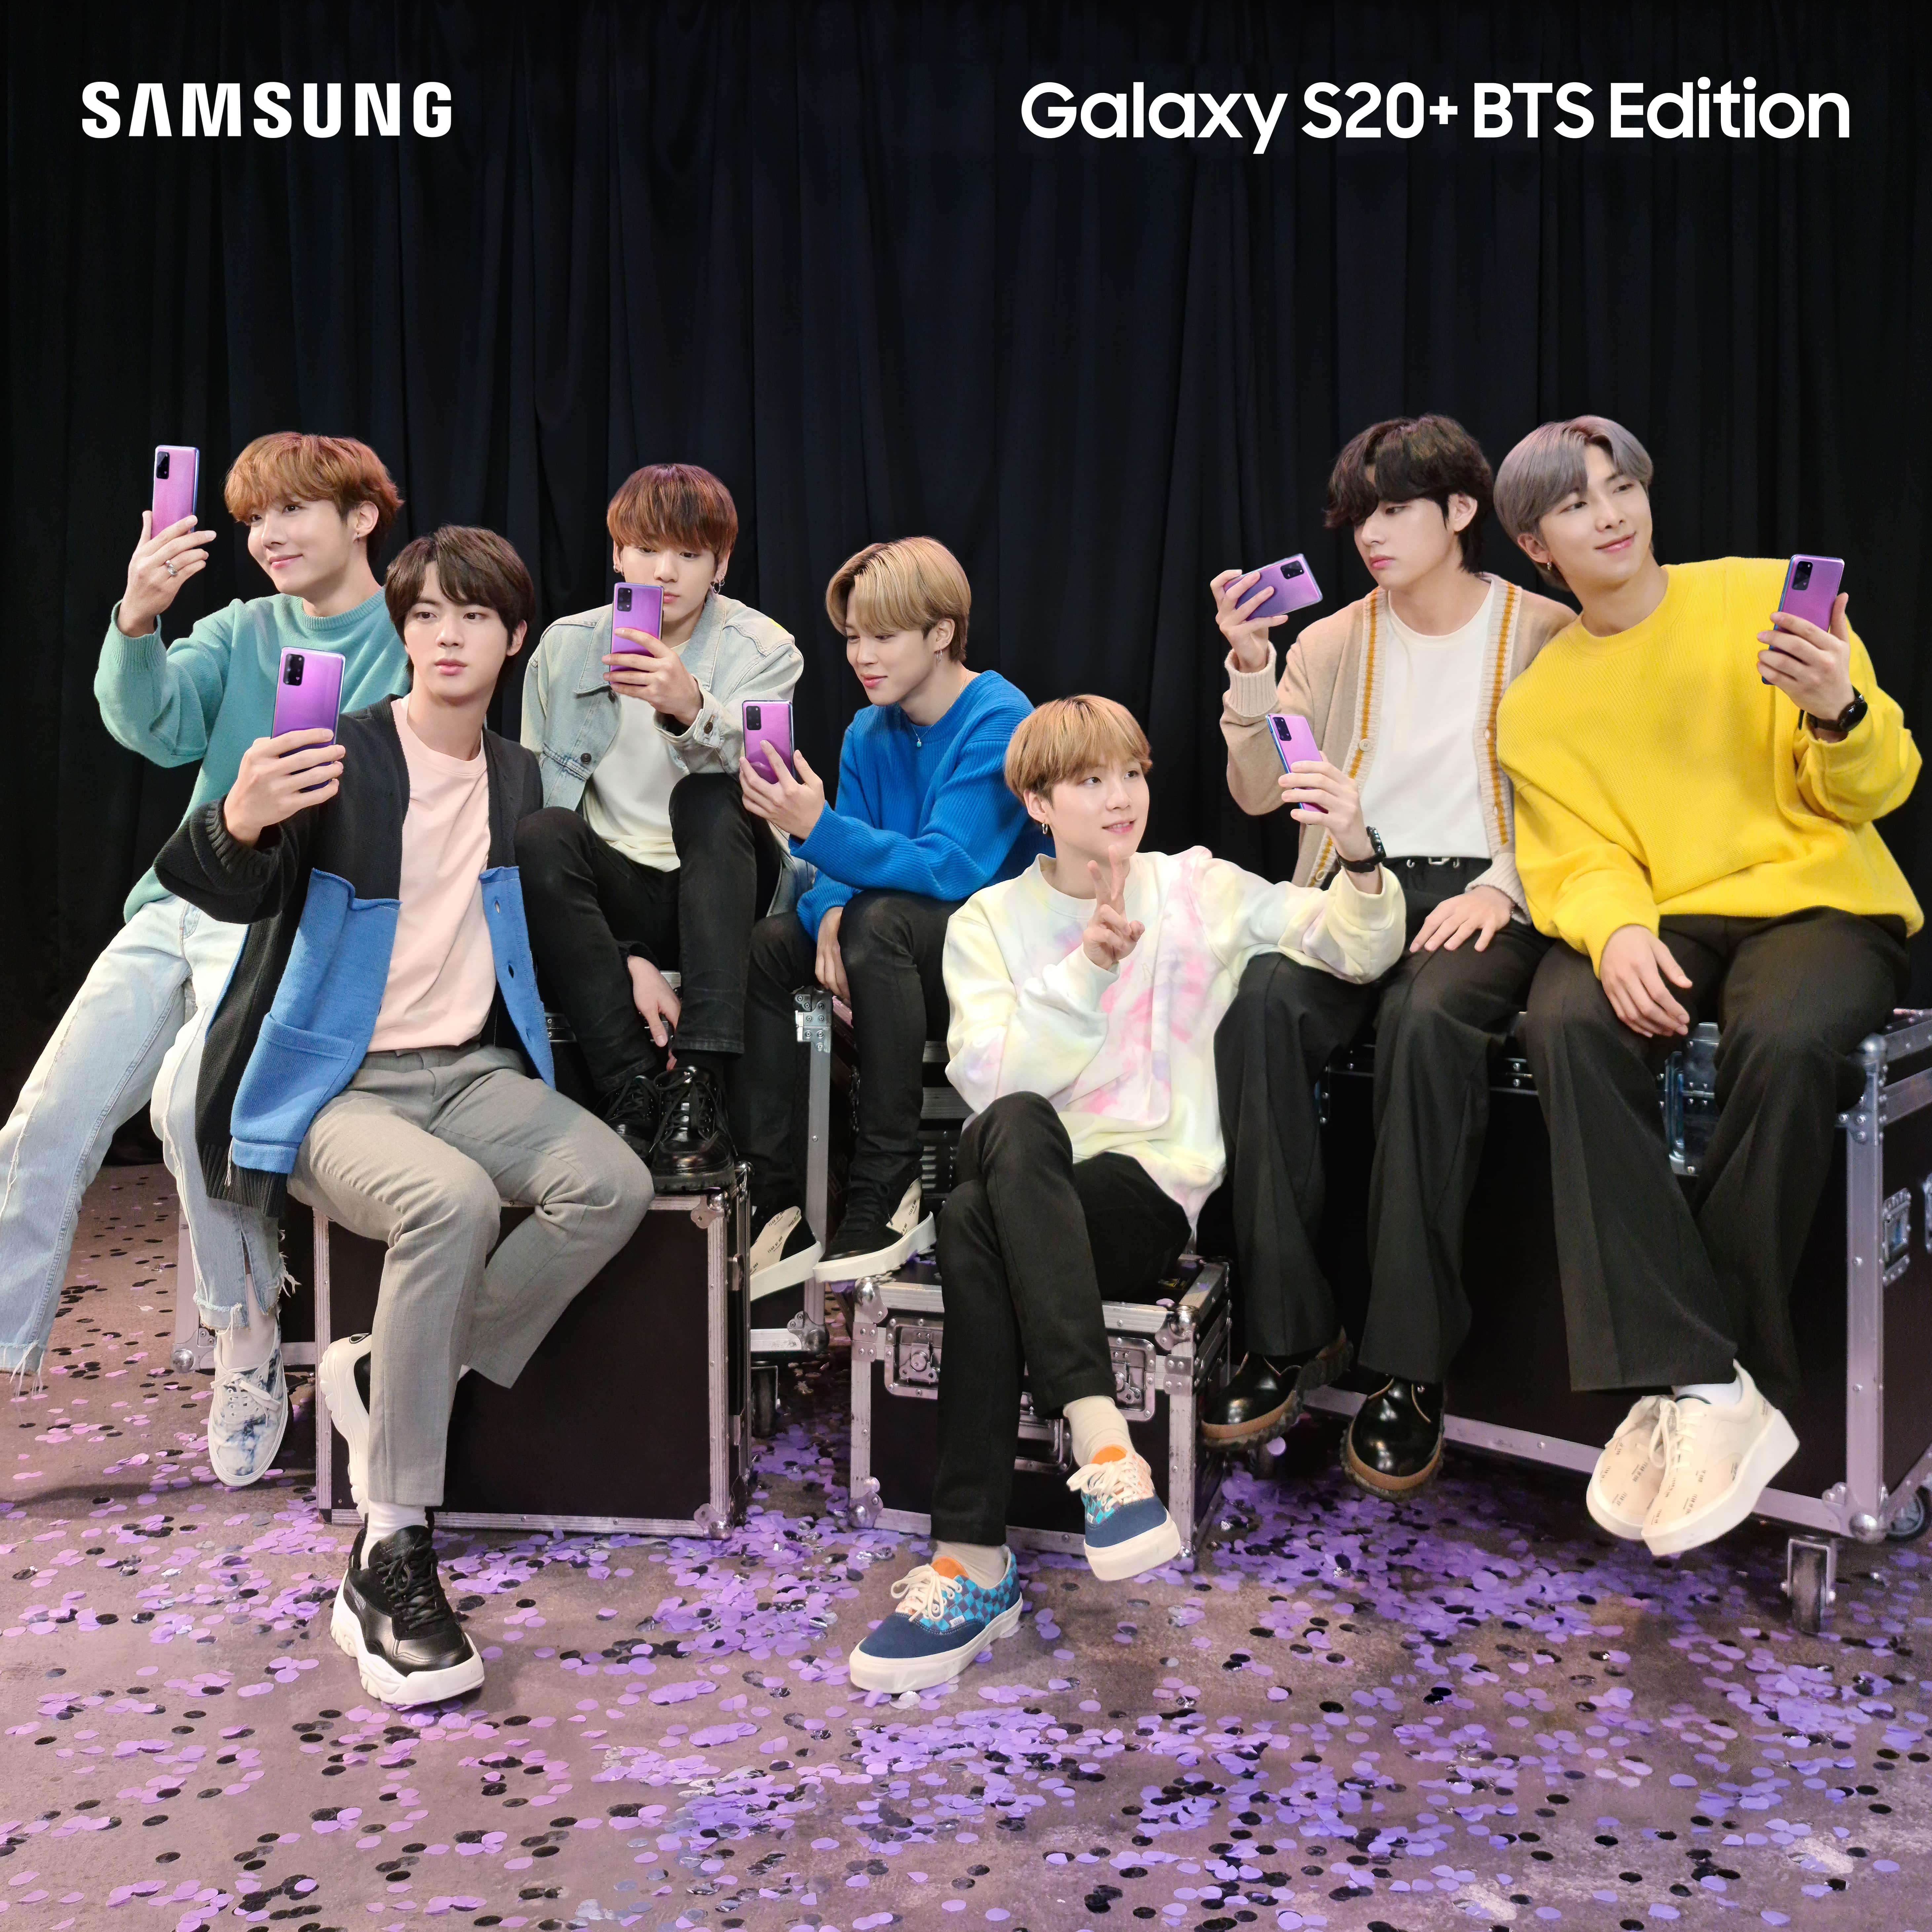 Samsung представляет Galaxy S20+ и Galaxy Buds+ BTS Edition